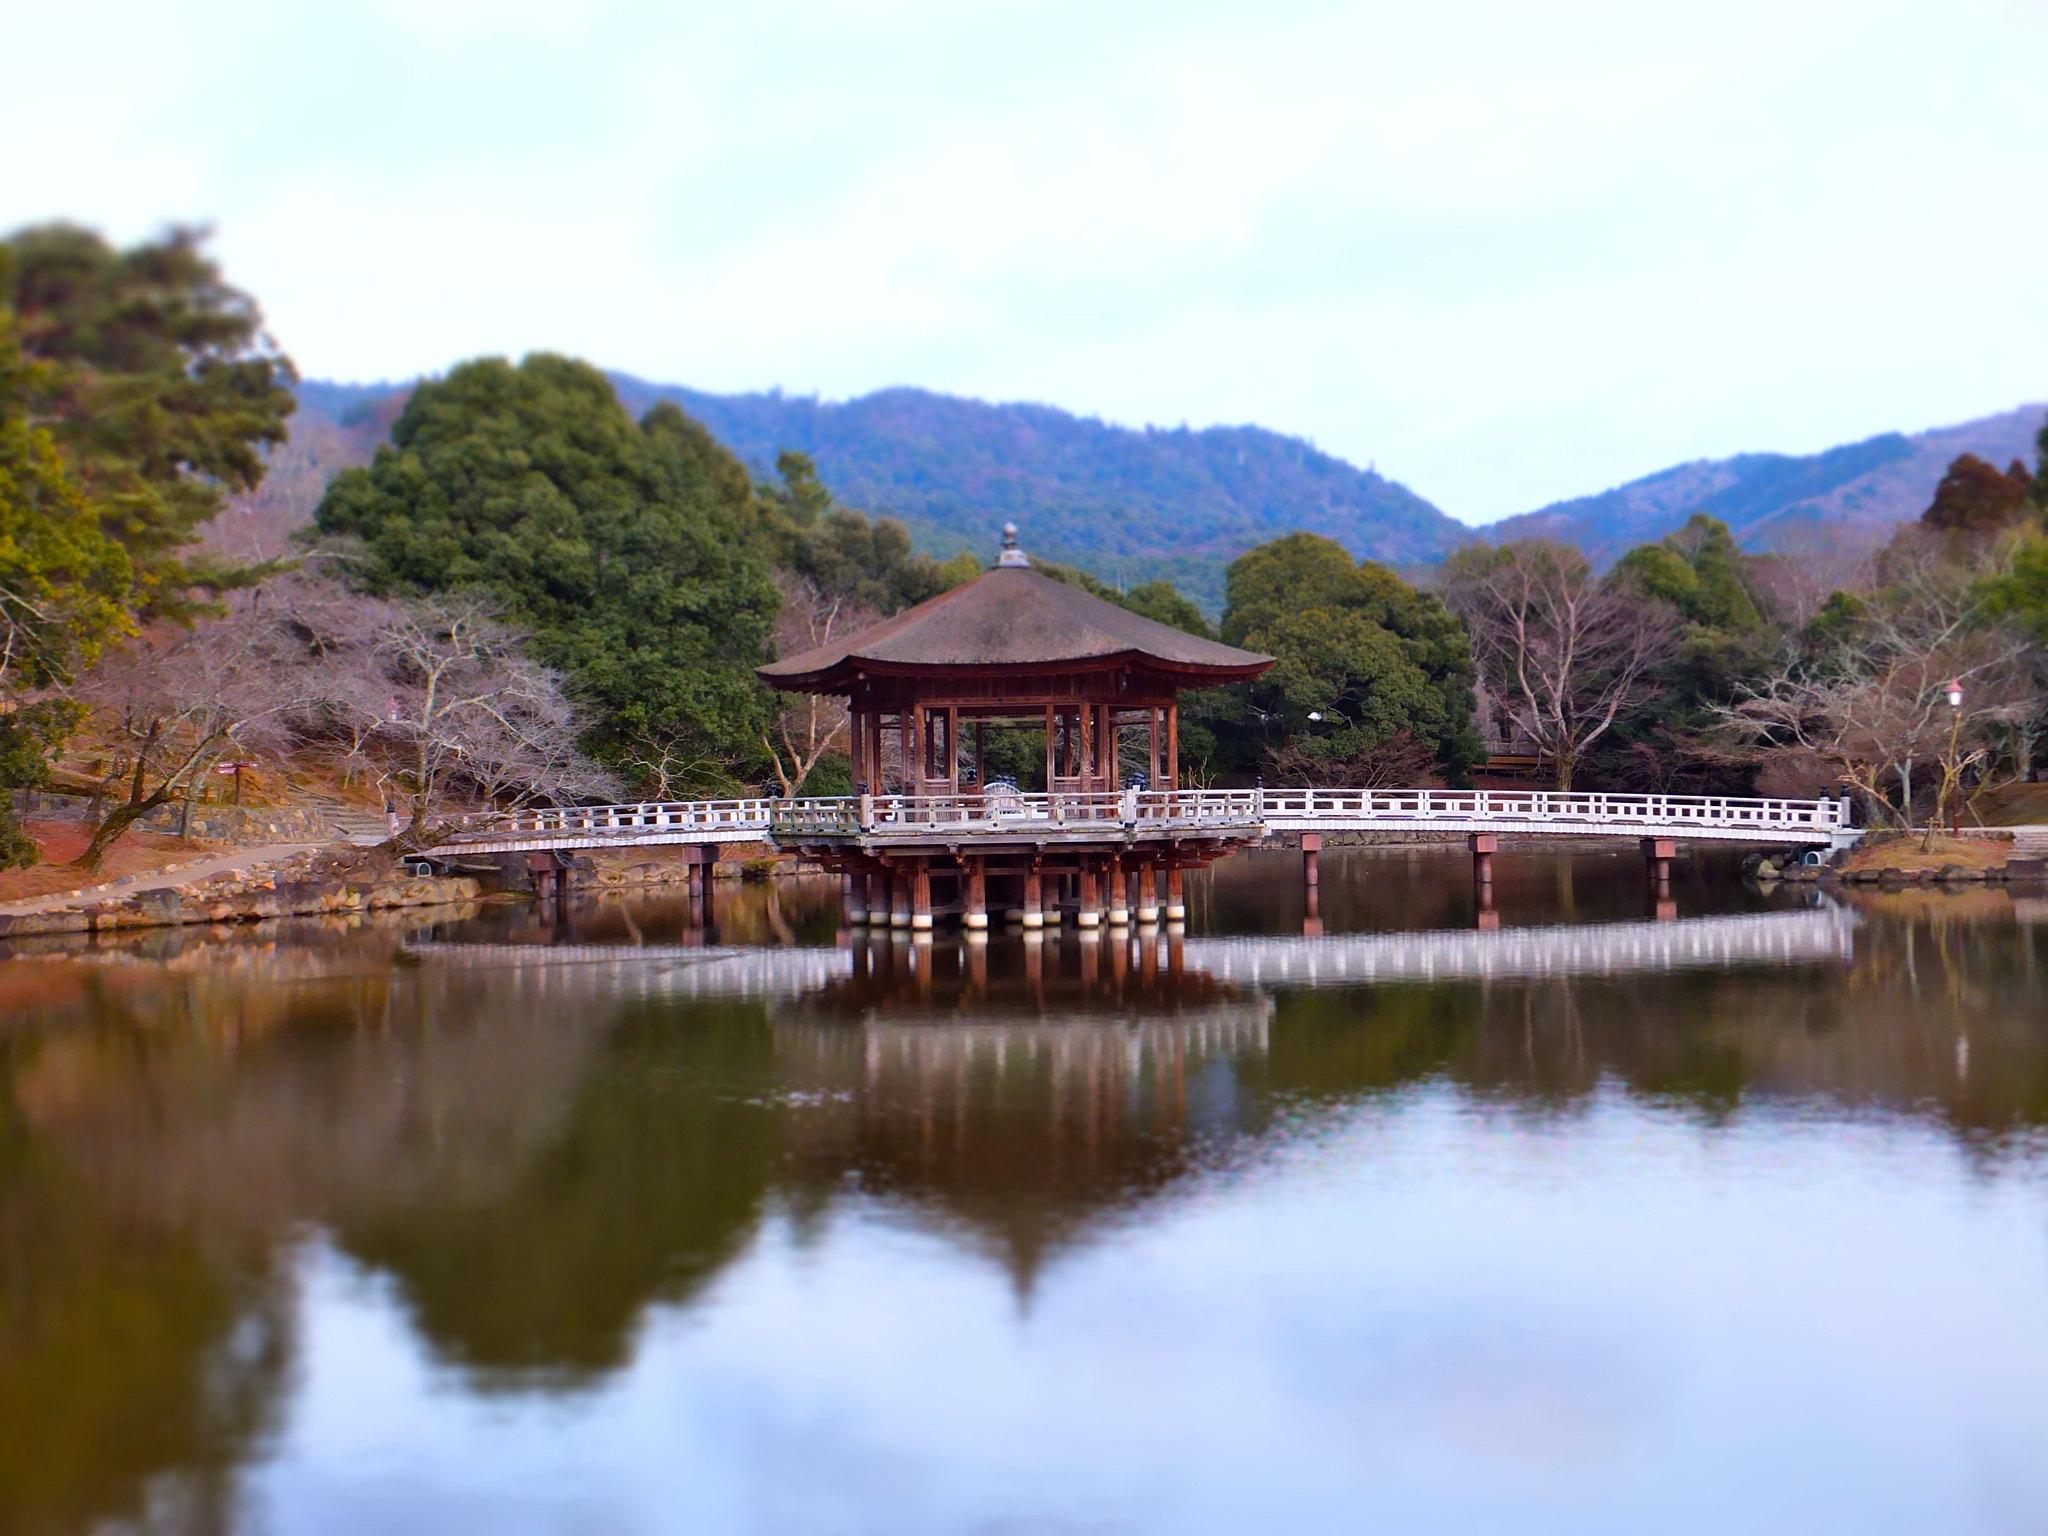 Il Parco di Nara in Giappone